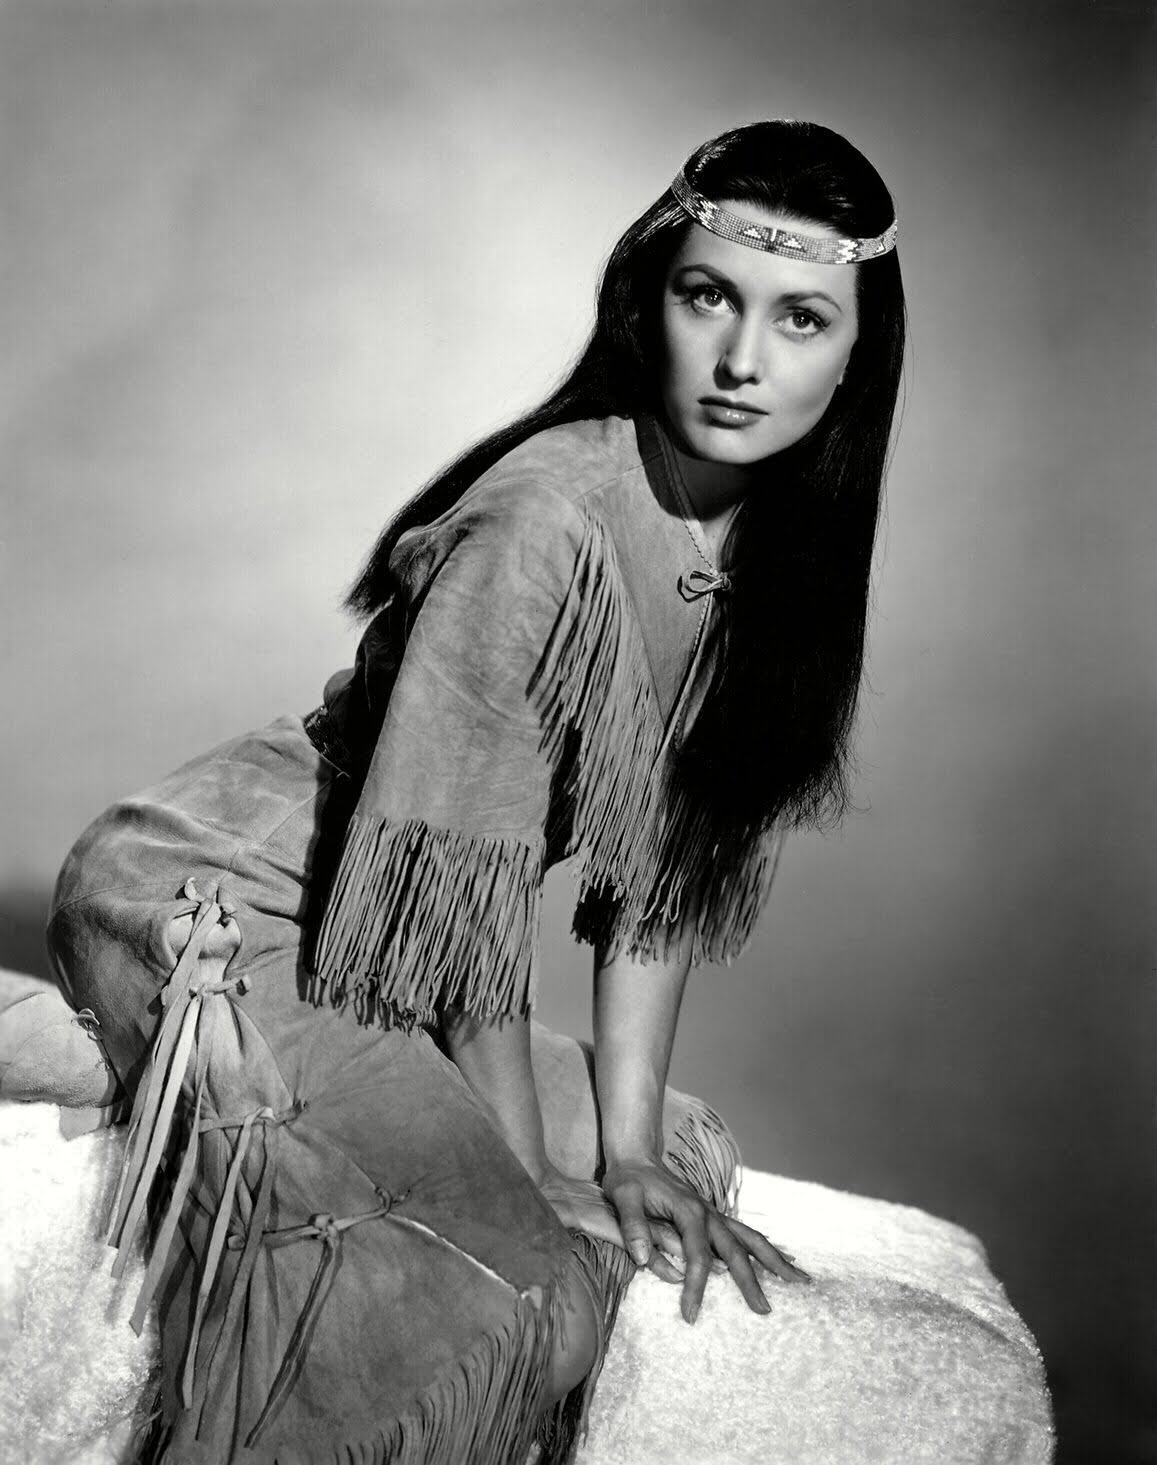 Vintage california cowgirl 1 - 1 1